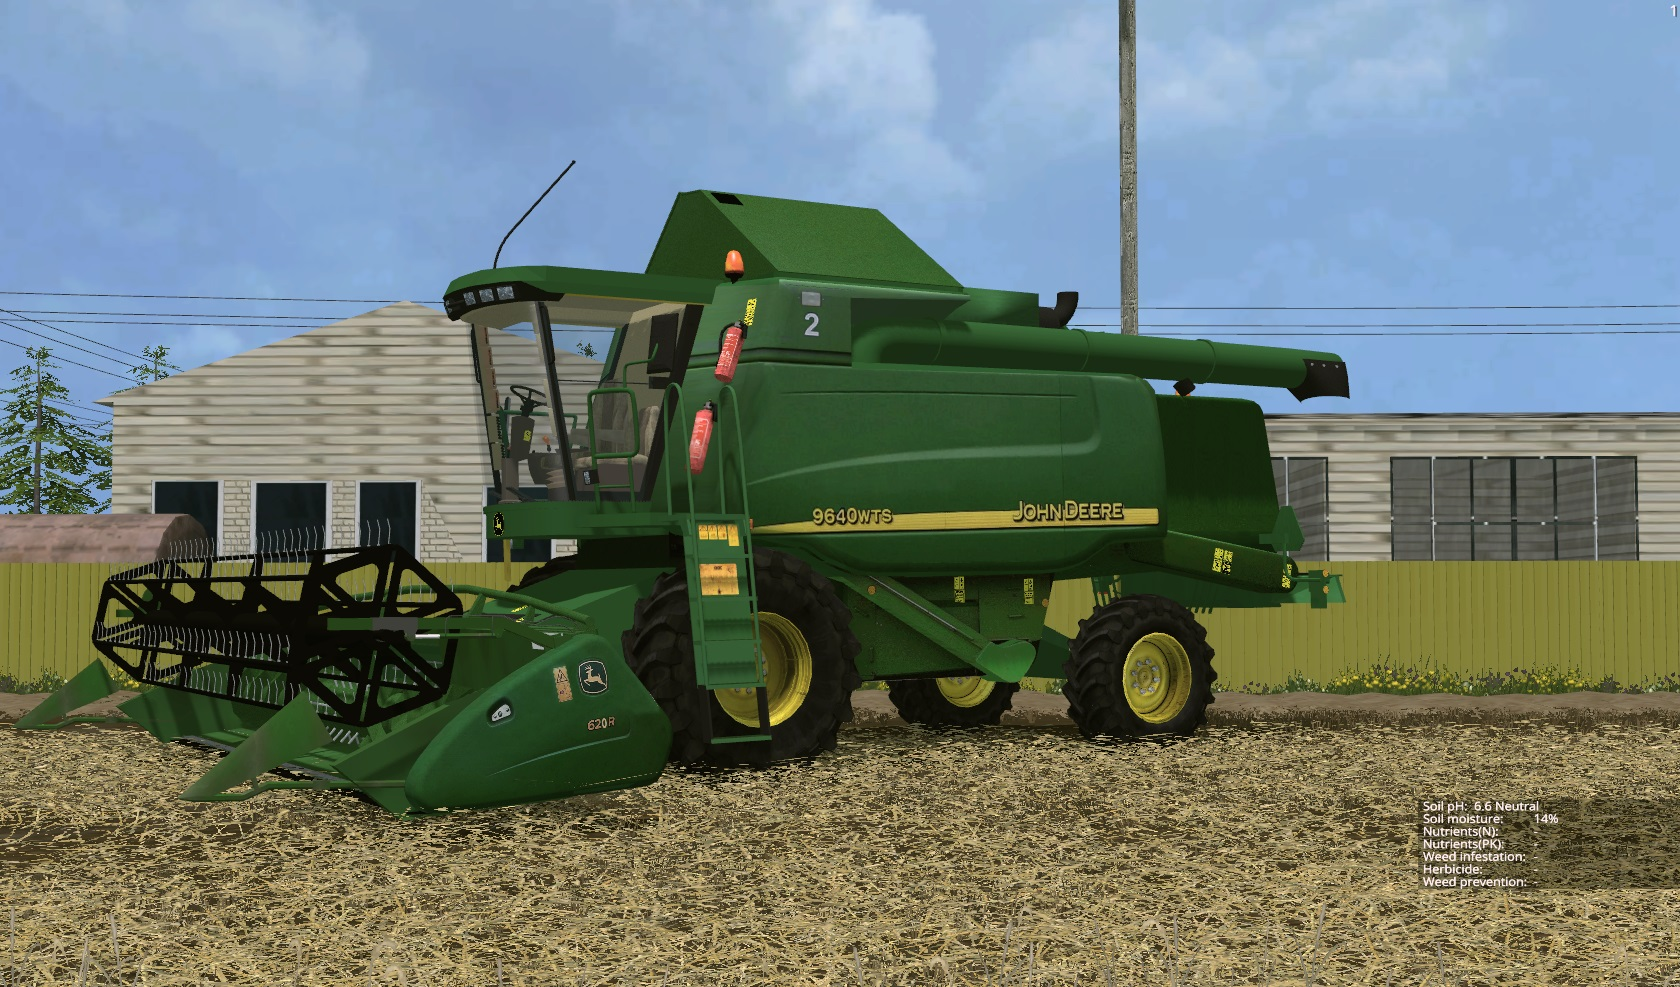 John deere 9640WTS V 2.1 Combine - Farming simulator 2017 ...